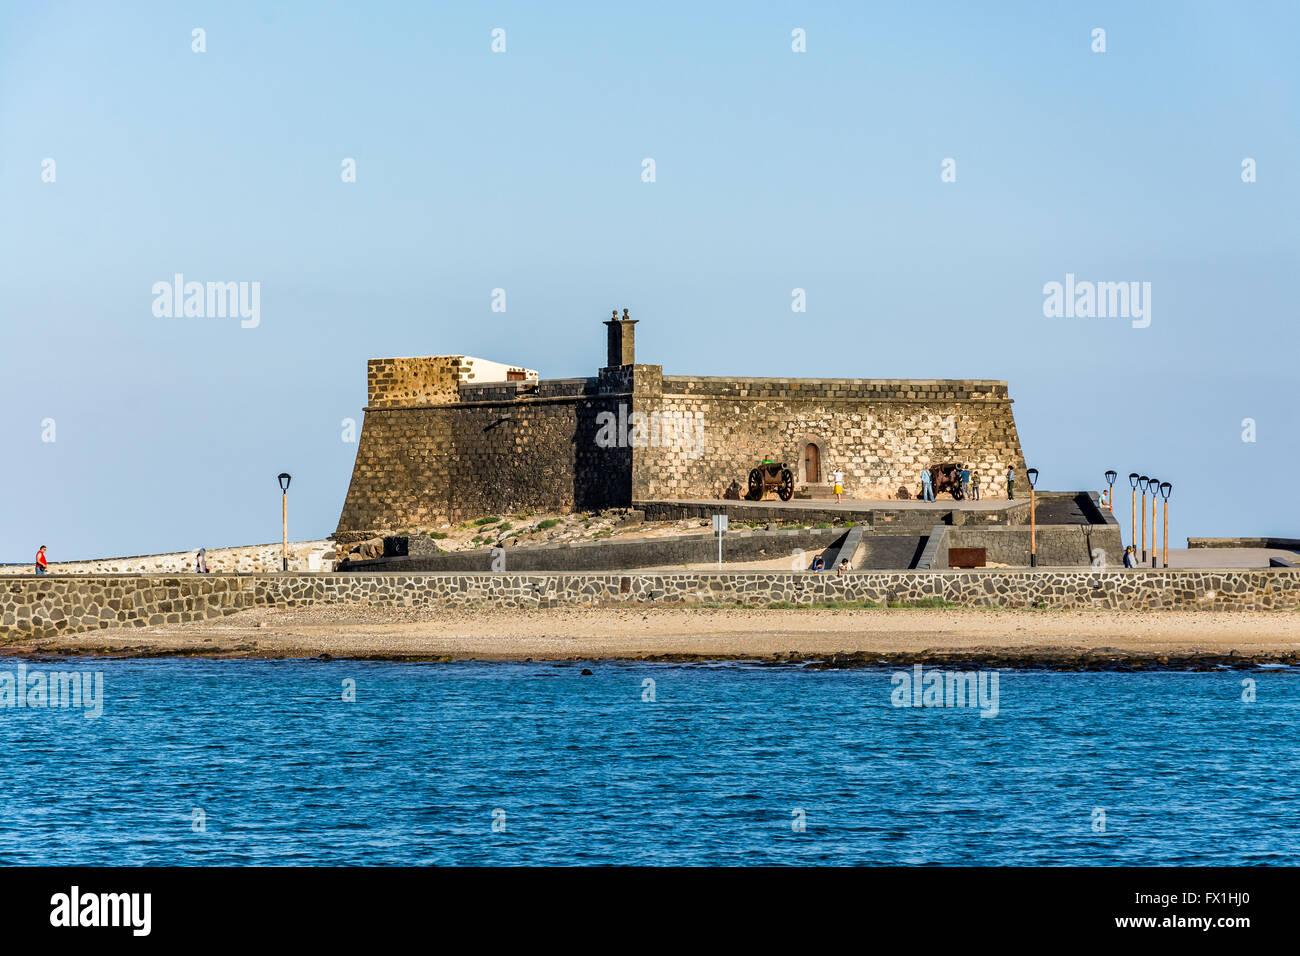 Castillo de San Gabriel - Saint Gabriel Castle in Arrecife and cannons in front of it, Lanzarote island, Spain - Stock Image